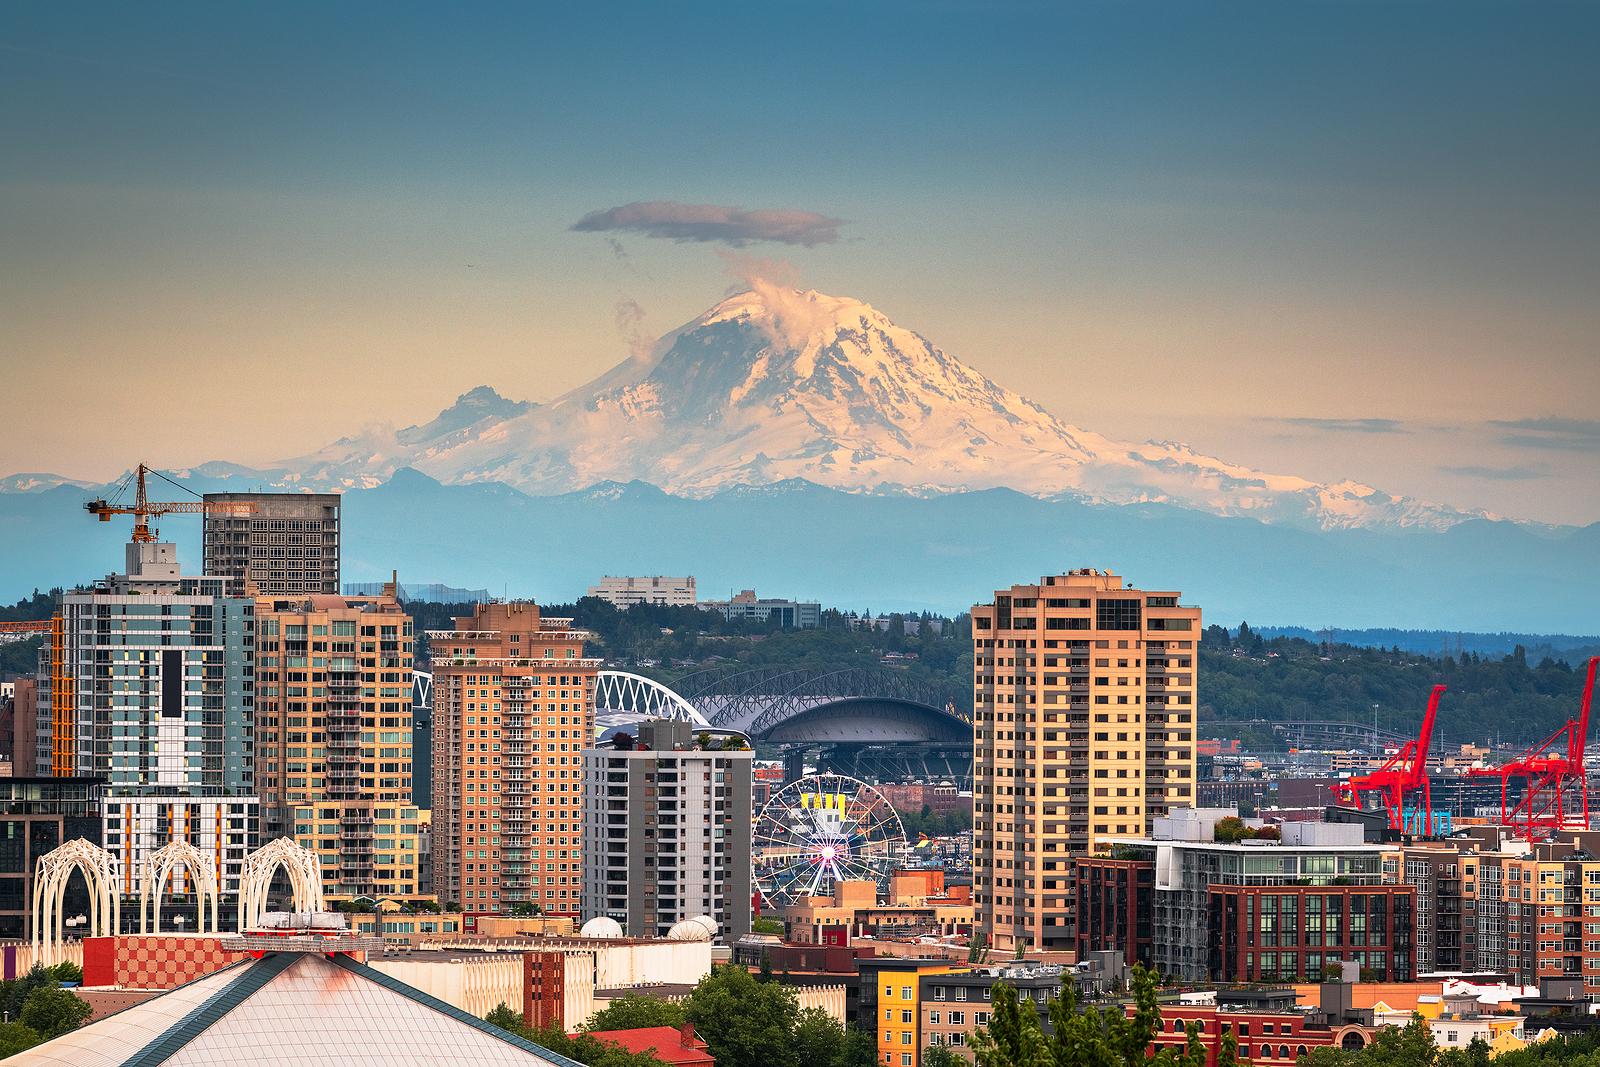 Seattle Skyline Mt. Rainier Viewed From Skyline of Seattle Washington